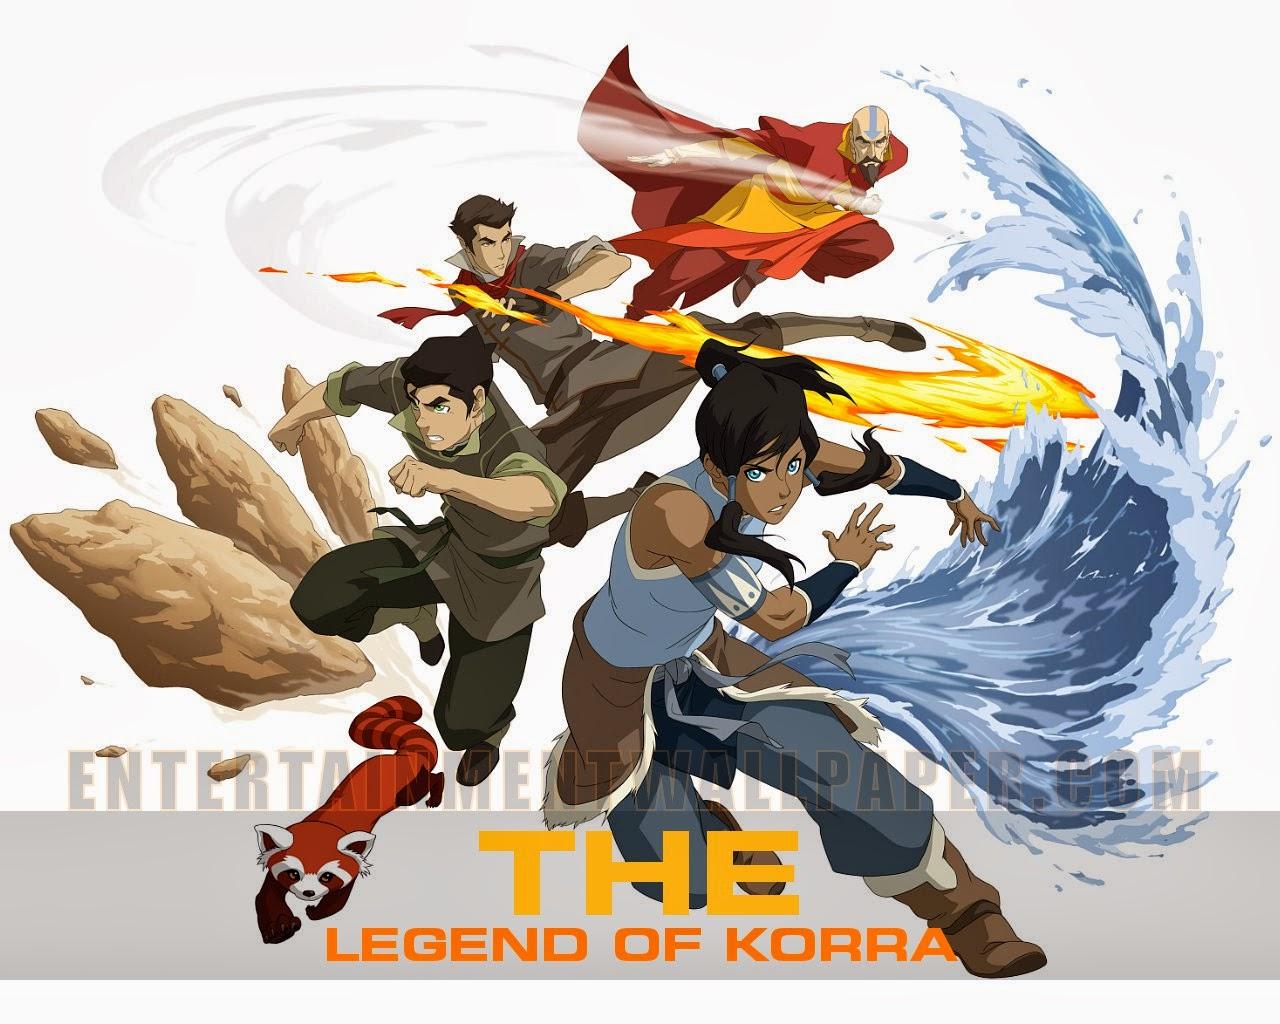 The Legend Of Korra HD WallpapersImagesPics   HD Wallpapers Blog 1280x1024